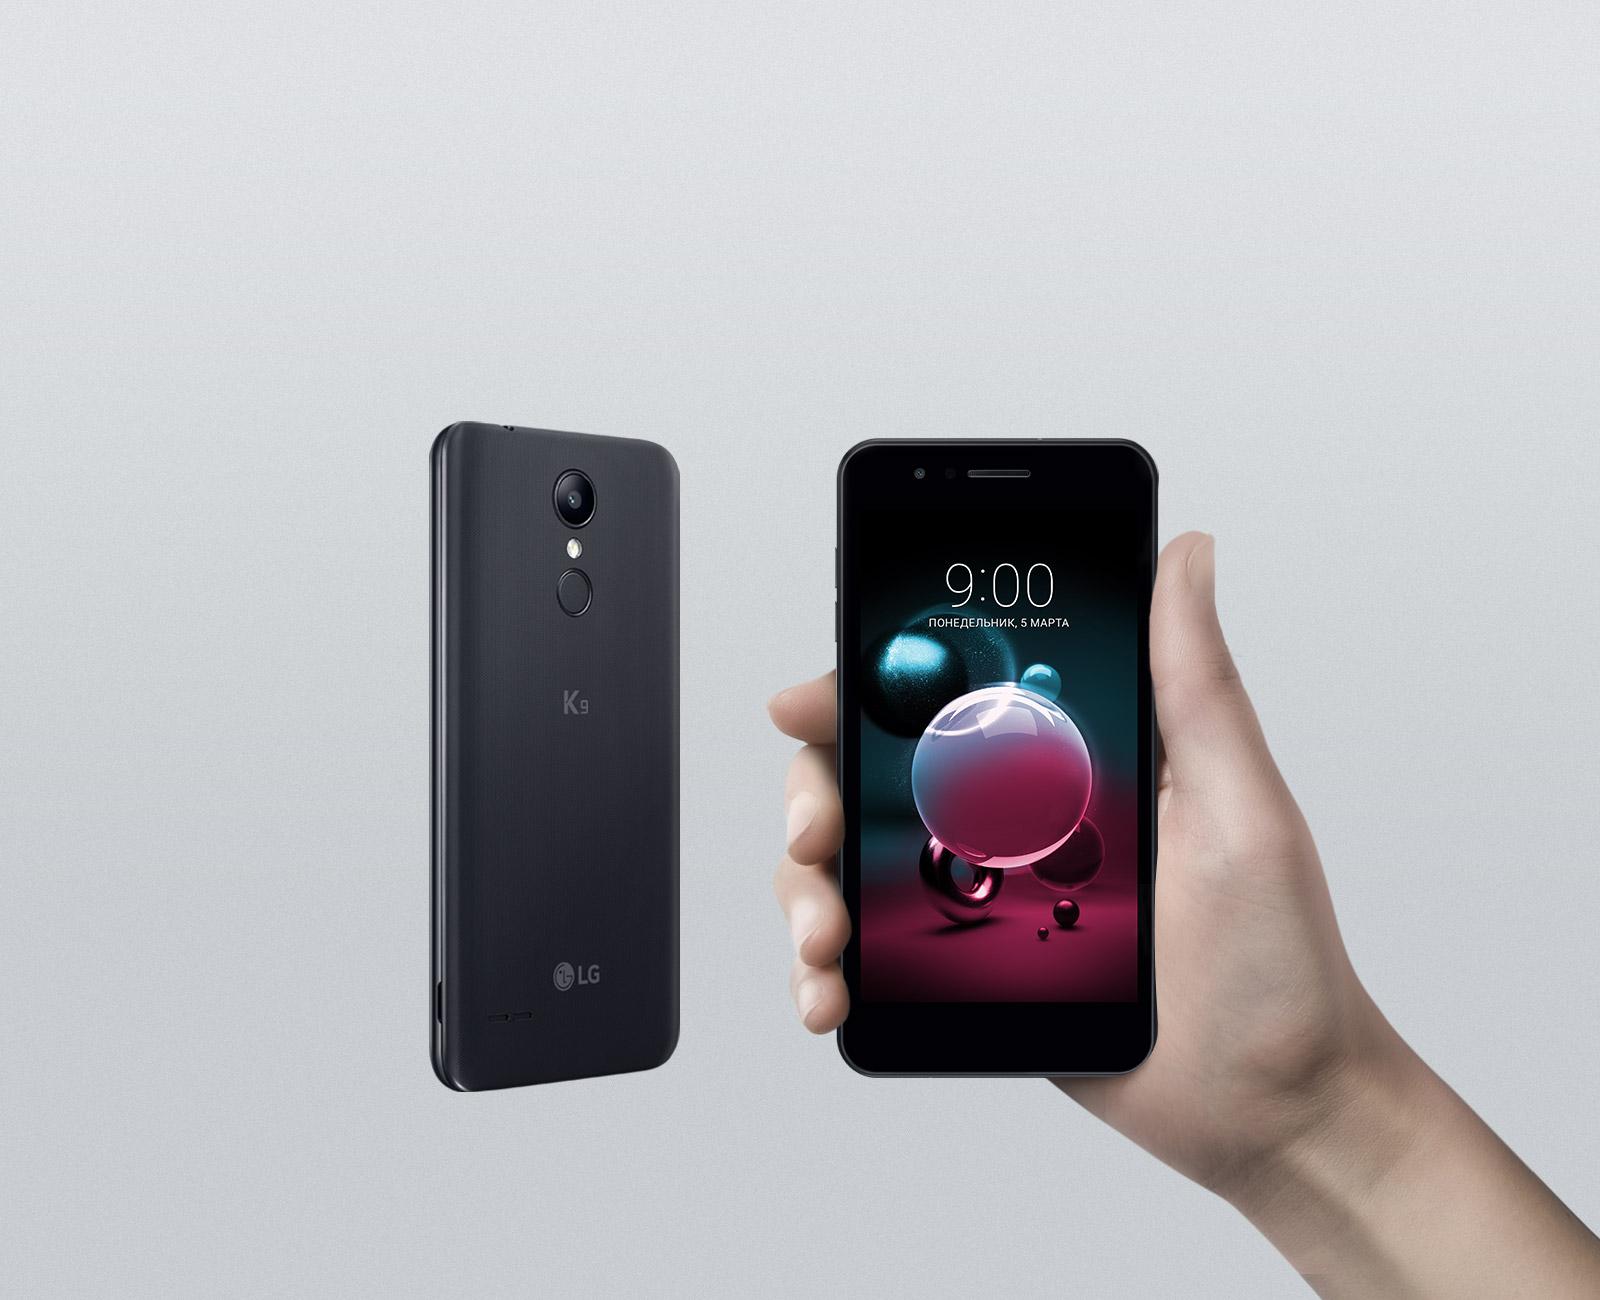 LG K8 (2018) Rusya'da LG K9 Olarak Duyuruldu